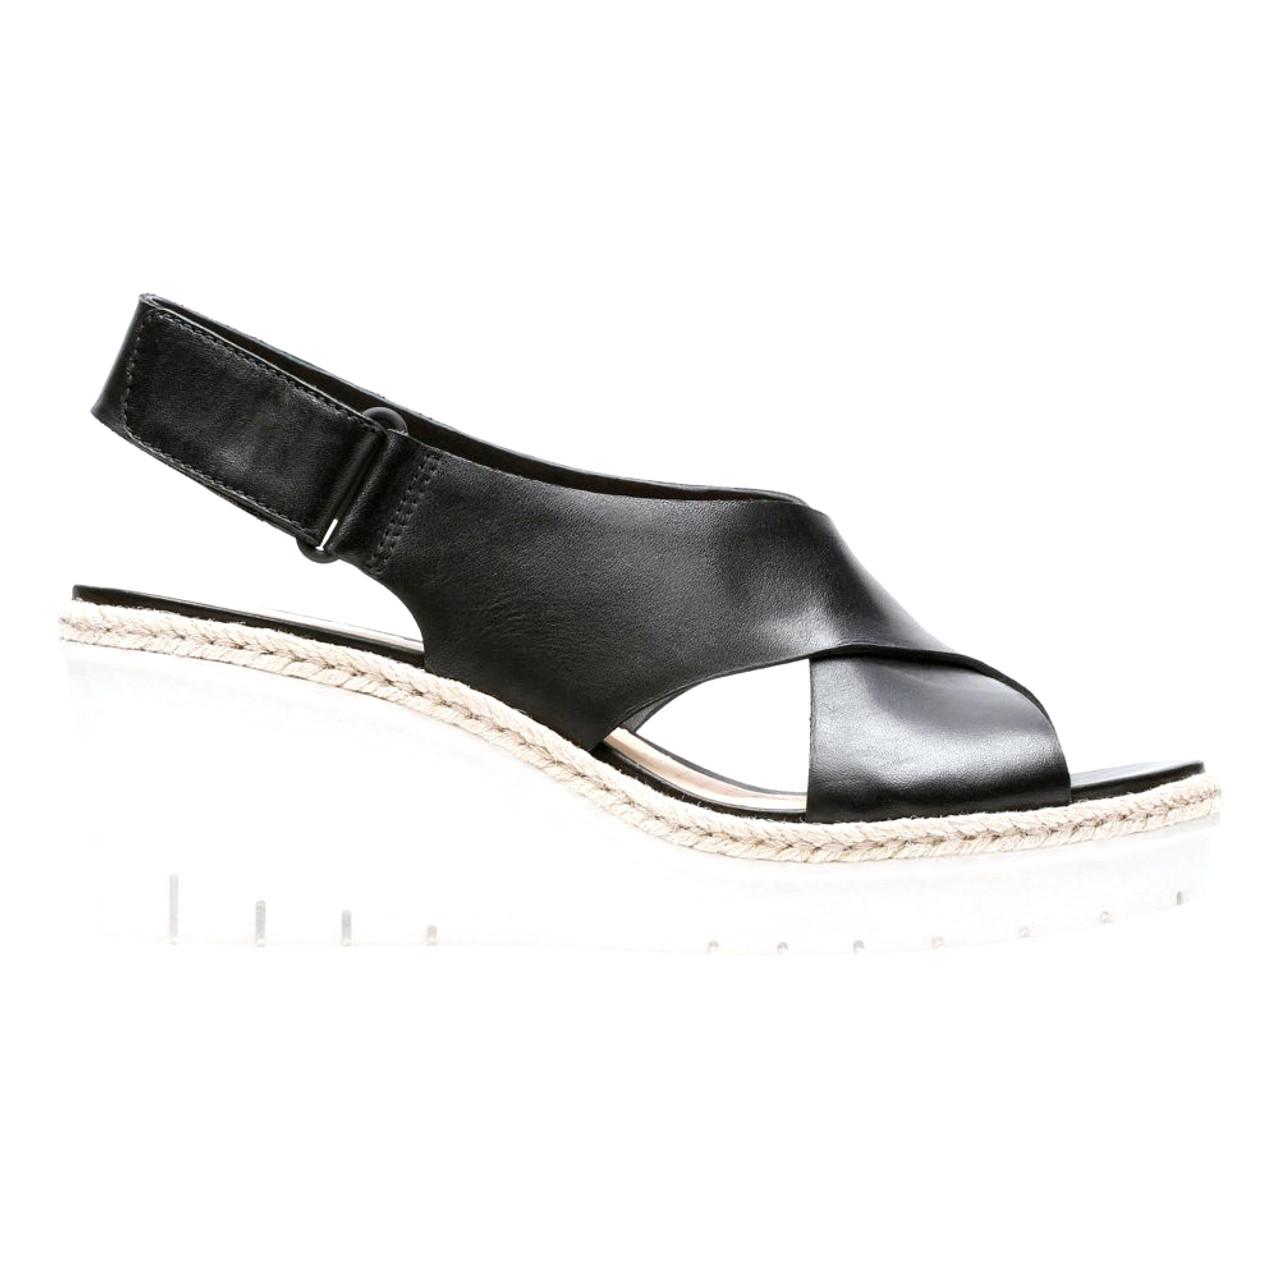 c352b7c858 Clarks Women's Palm Glow Wedge Slingback Sandal Black Leather - Shop now @  Shoolu.com